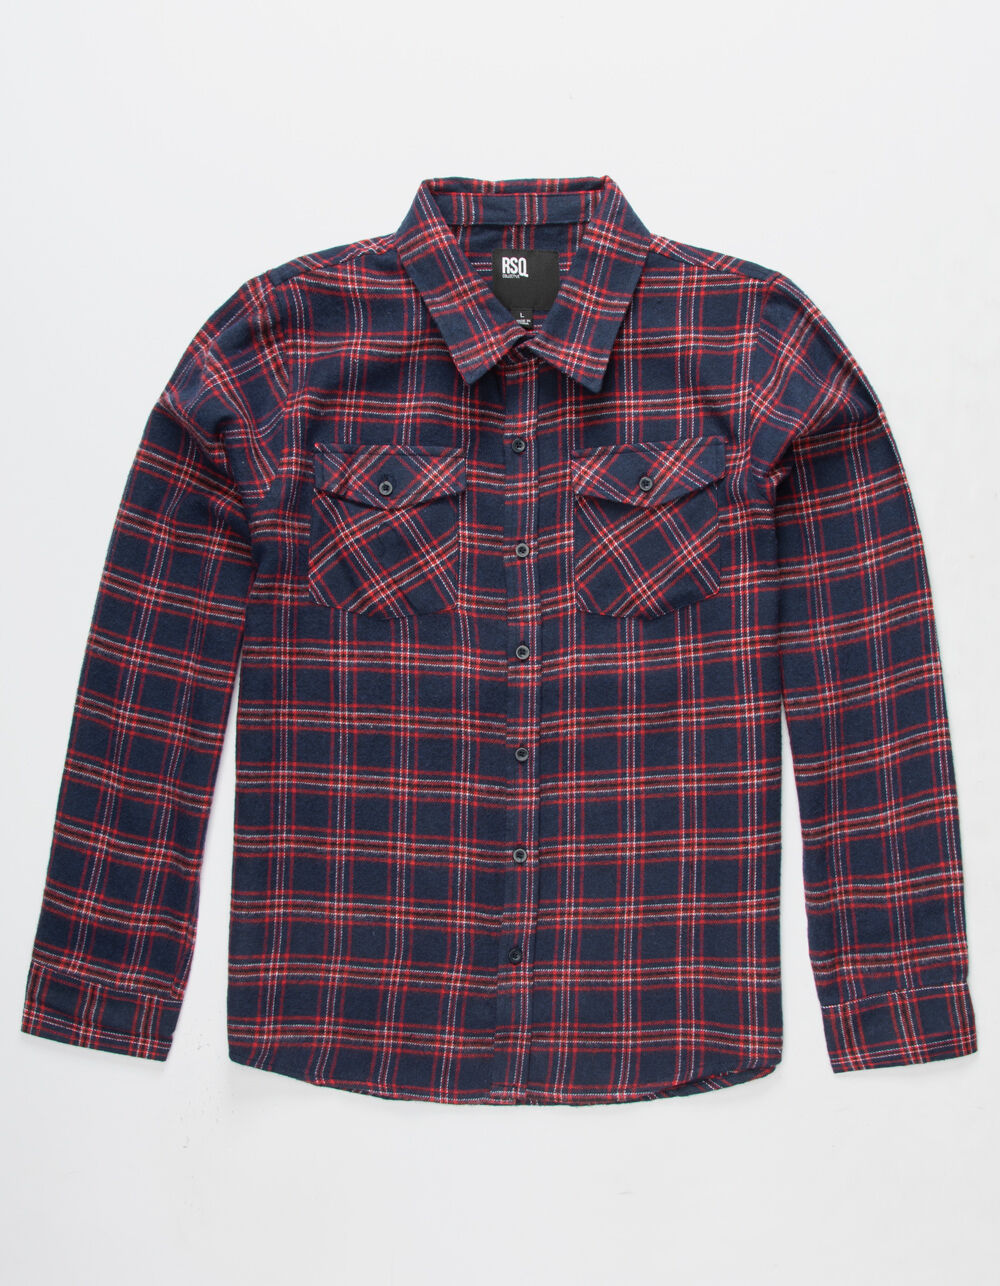 RSQ Mead Boys Flannel Shirt